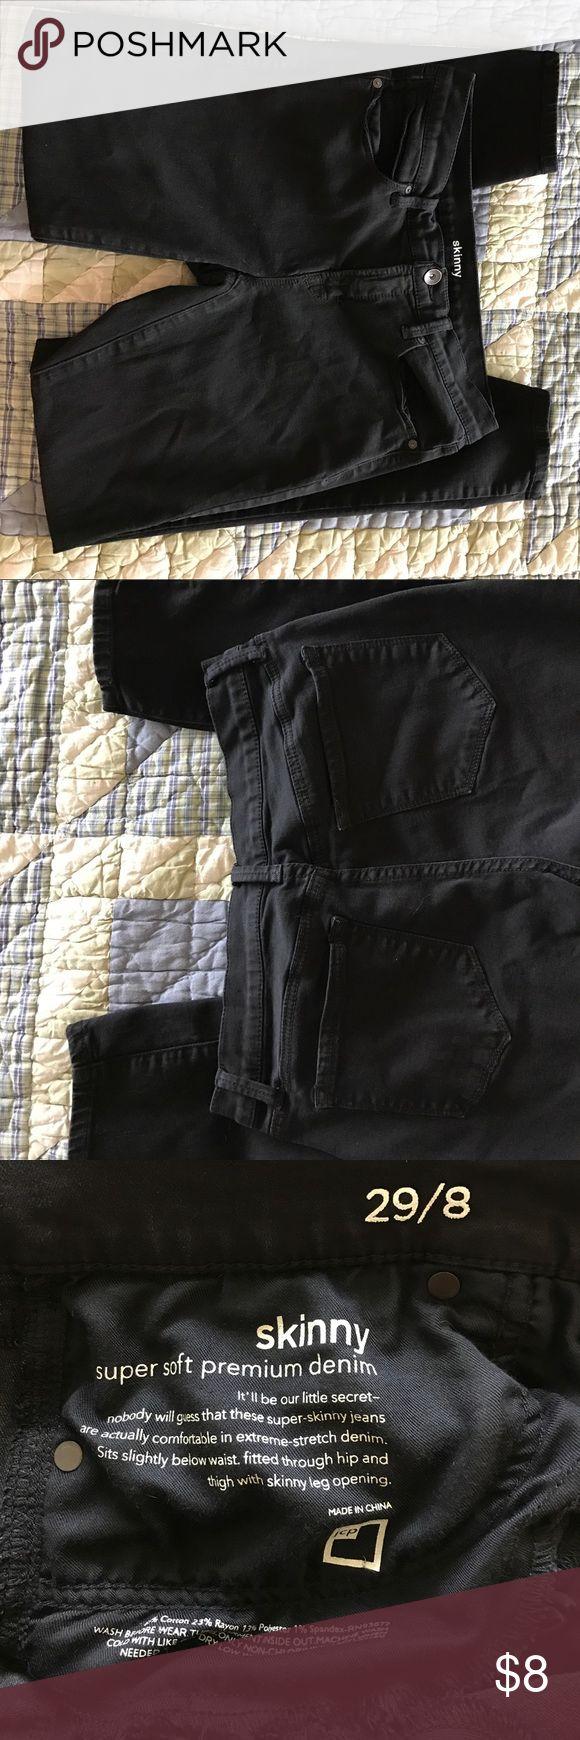 Black Skinny Jeans size 8 Really soft dark black skinny jeans.  Size 8.  JC Penney Brand.  Great condition! jcpenney Jeans Skinny